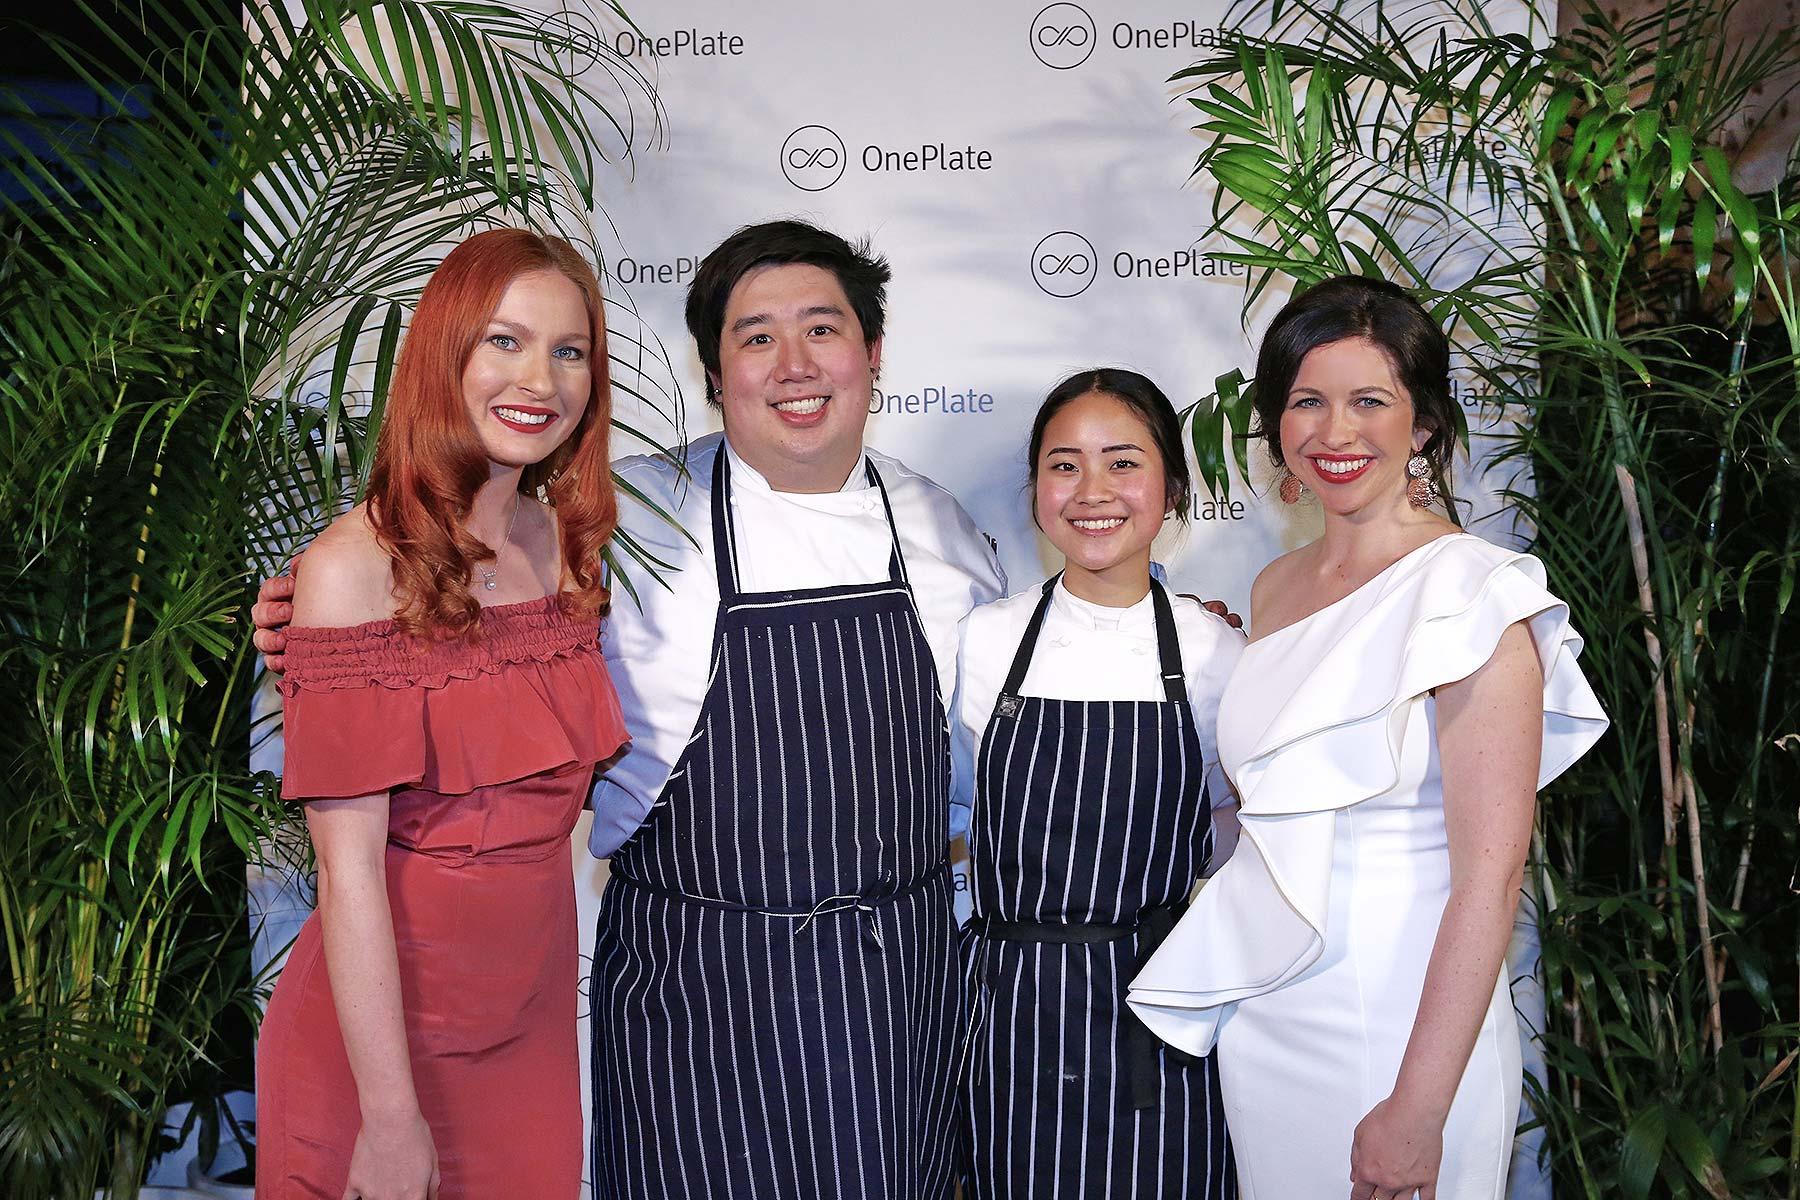 OnePlate's Sami, Bryan Zhu, Michelle Lukman and OnePlate co-founder Thérèse Nichols.